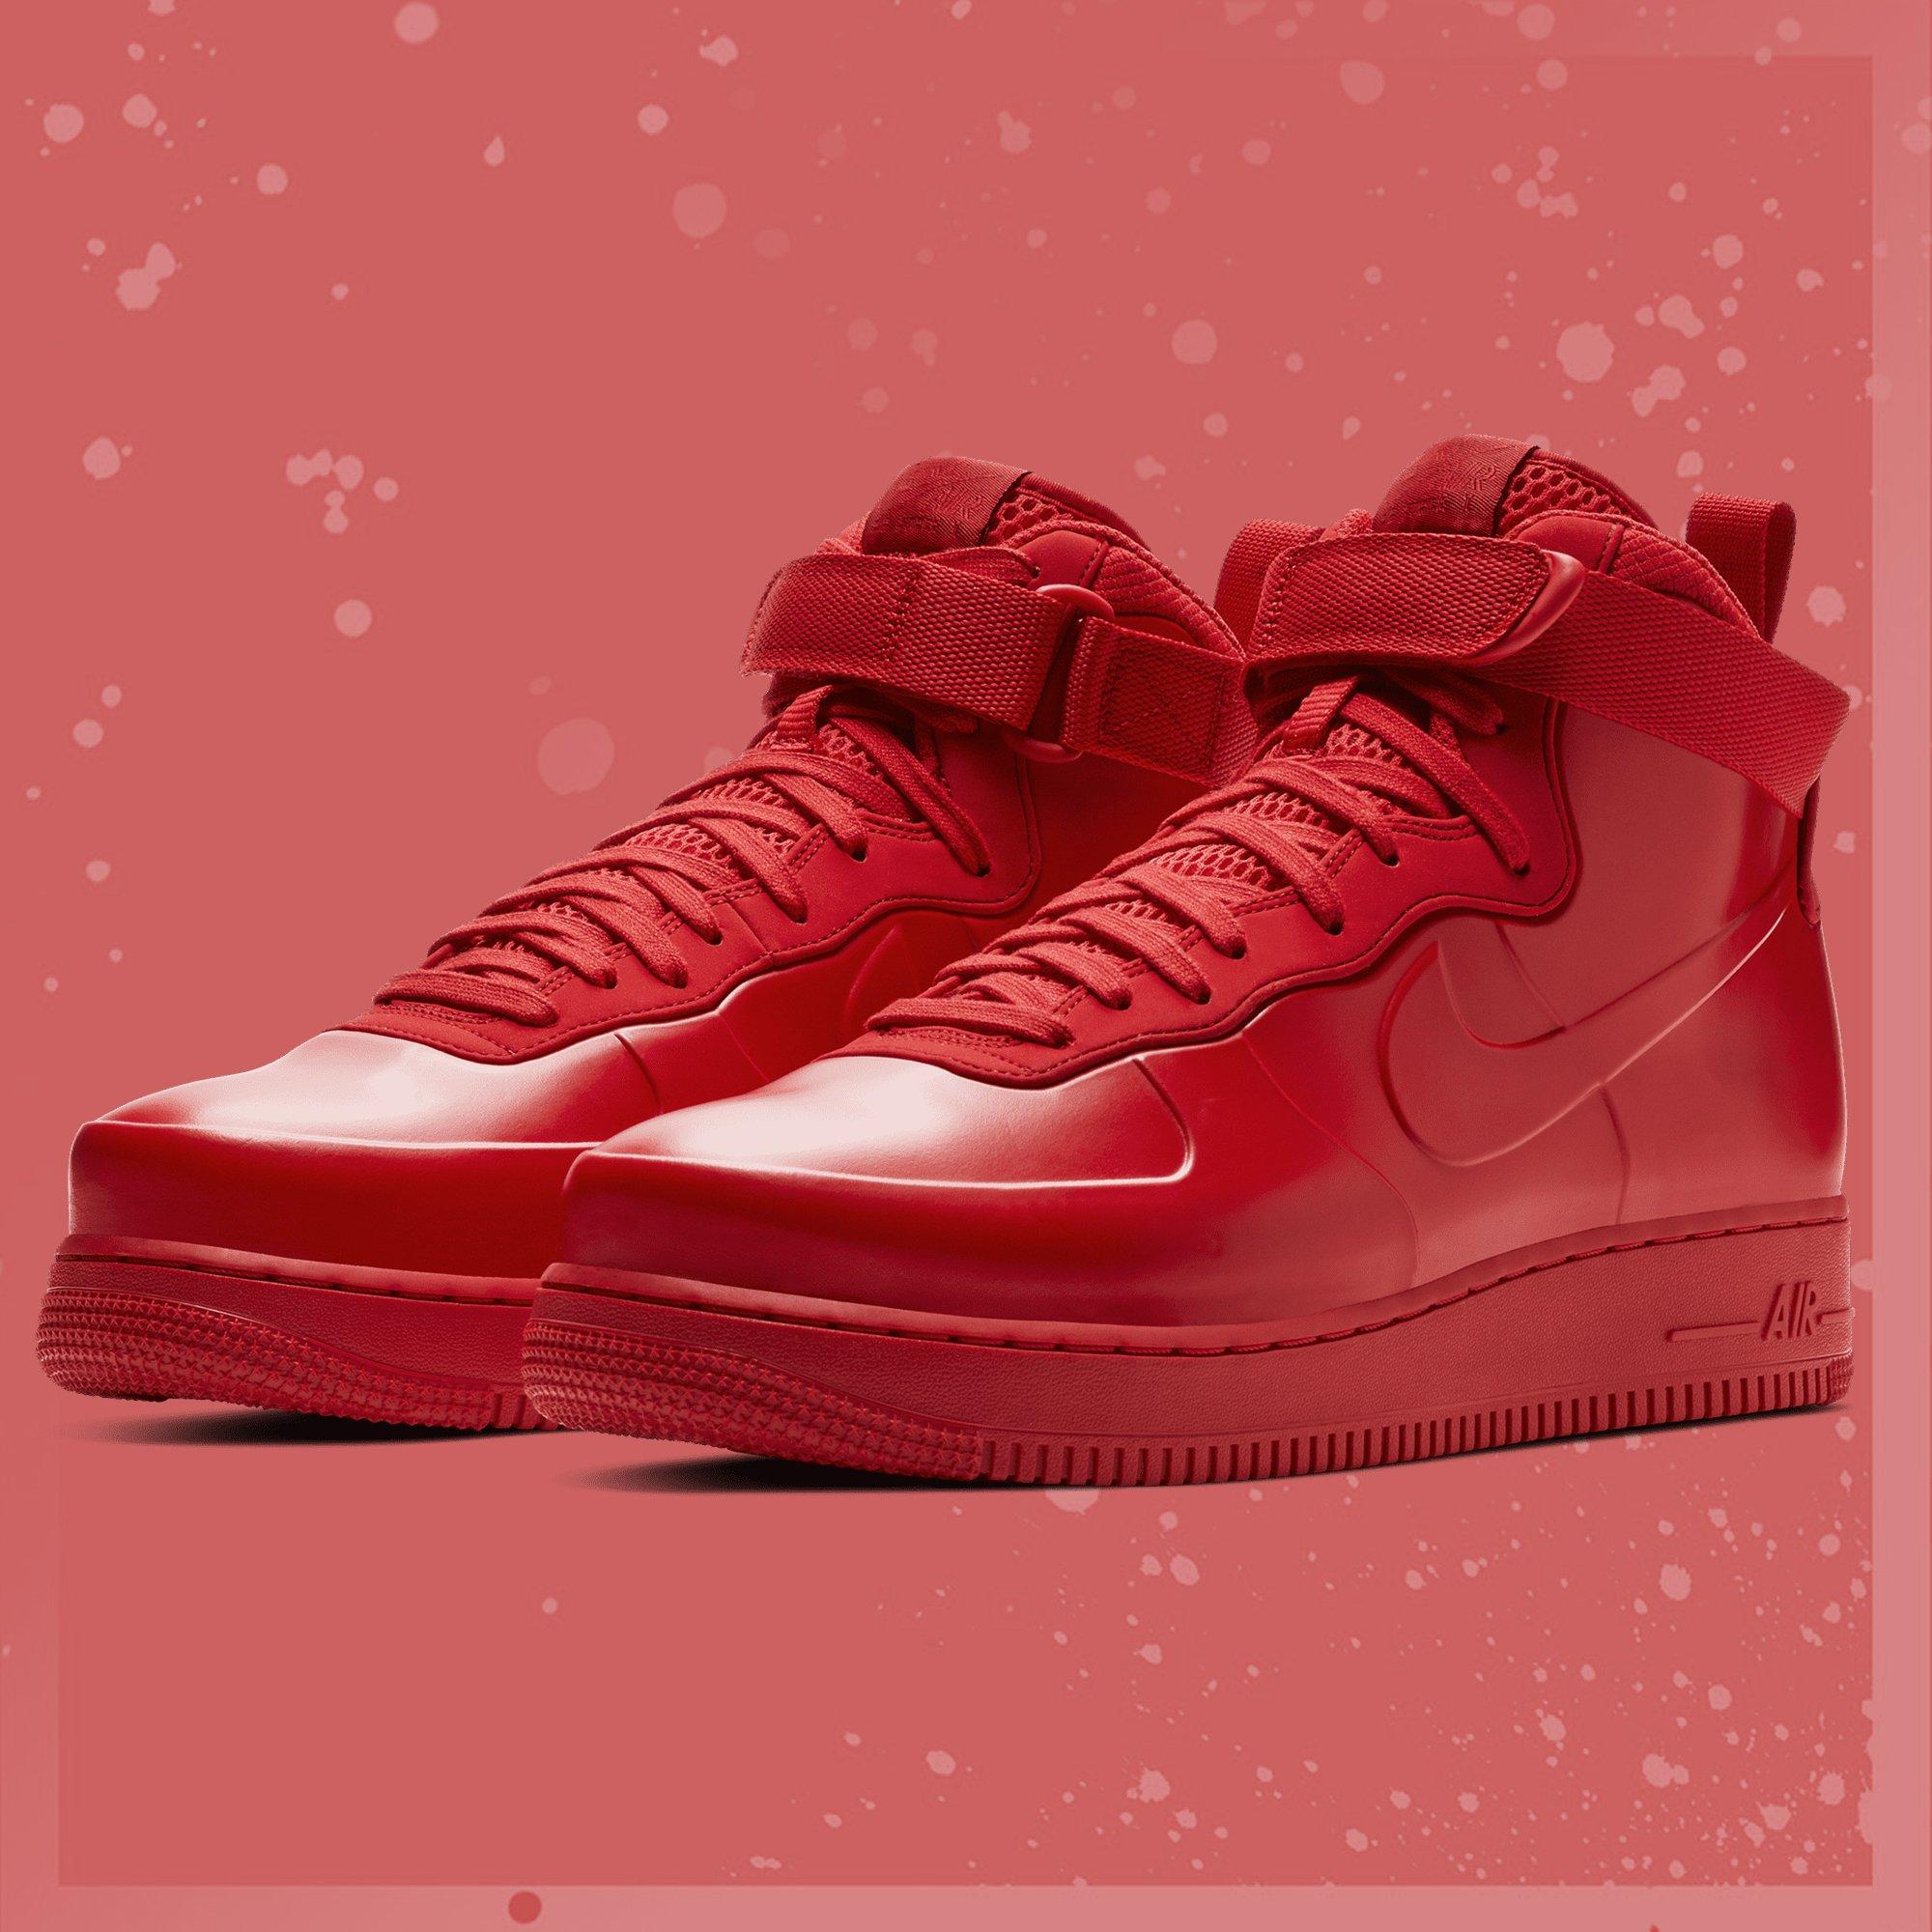 8a47a11d723a GB S Sneaker Shop on Twitter